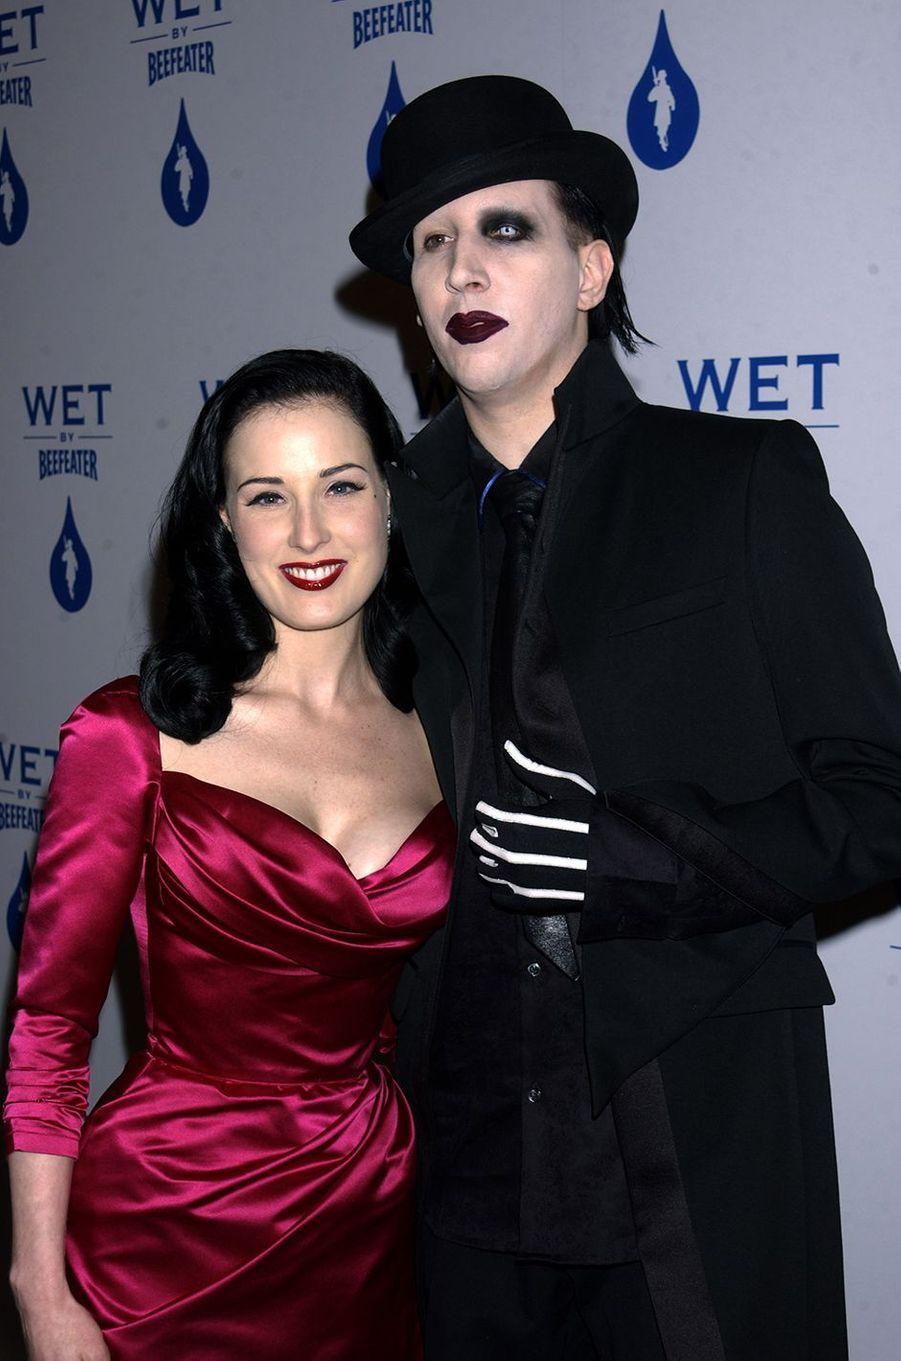 Dita Von Teese et Marilyn Manson lors d'un gala en mai 2003